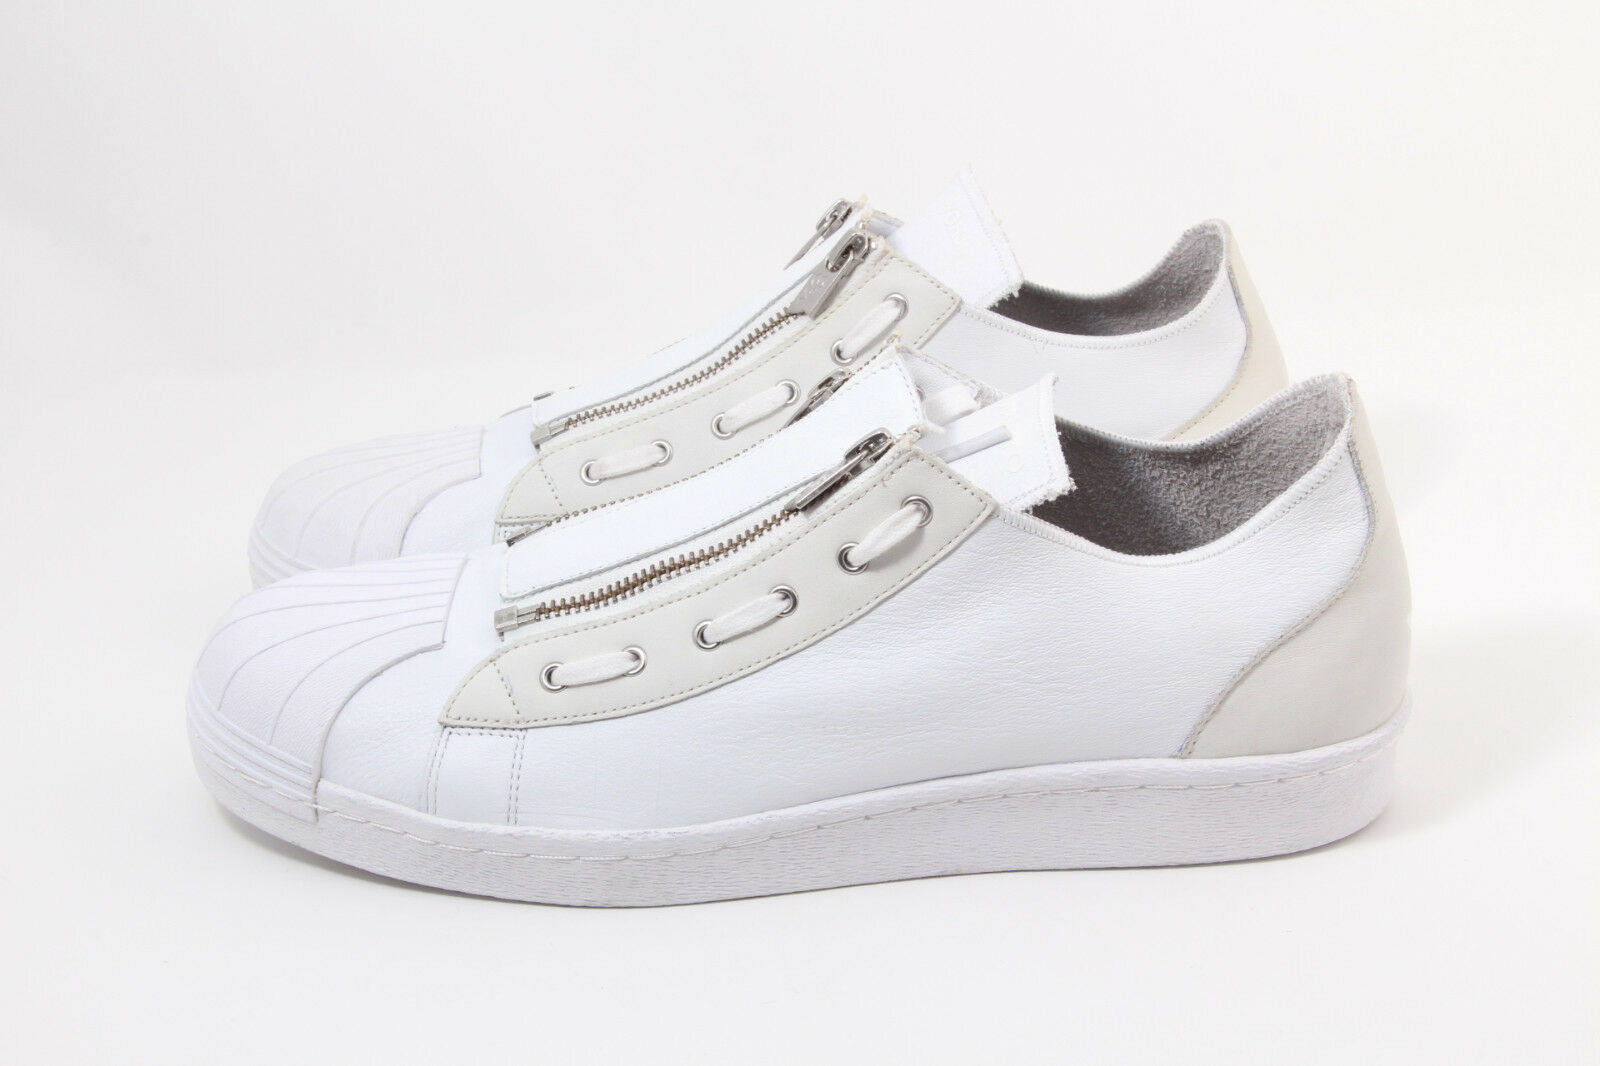 Adidas Y-3 Super Zip White Yohji Yamamoto CG3210 US 11